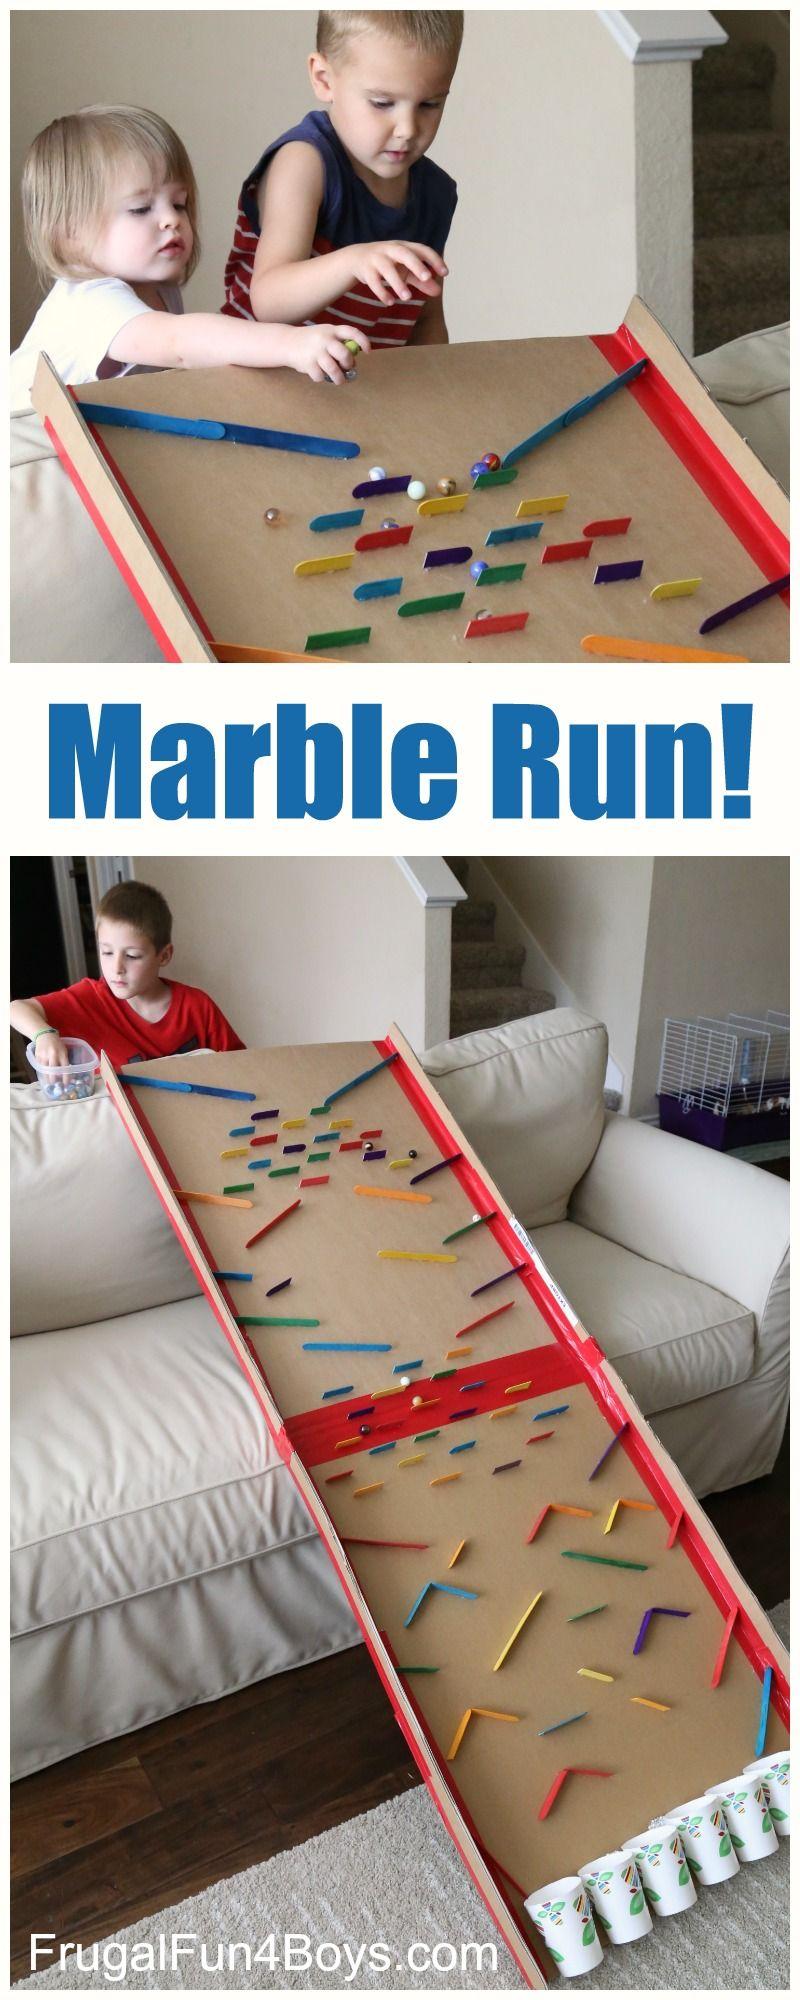 Turn a Cardboard Box into an Epic Marble Run